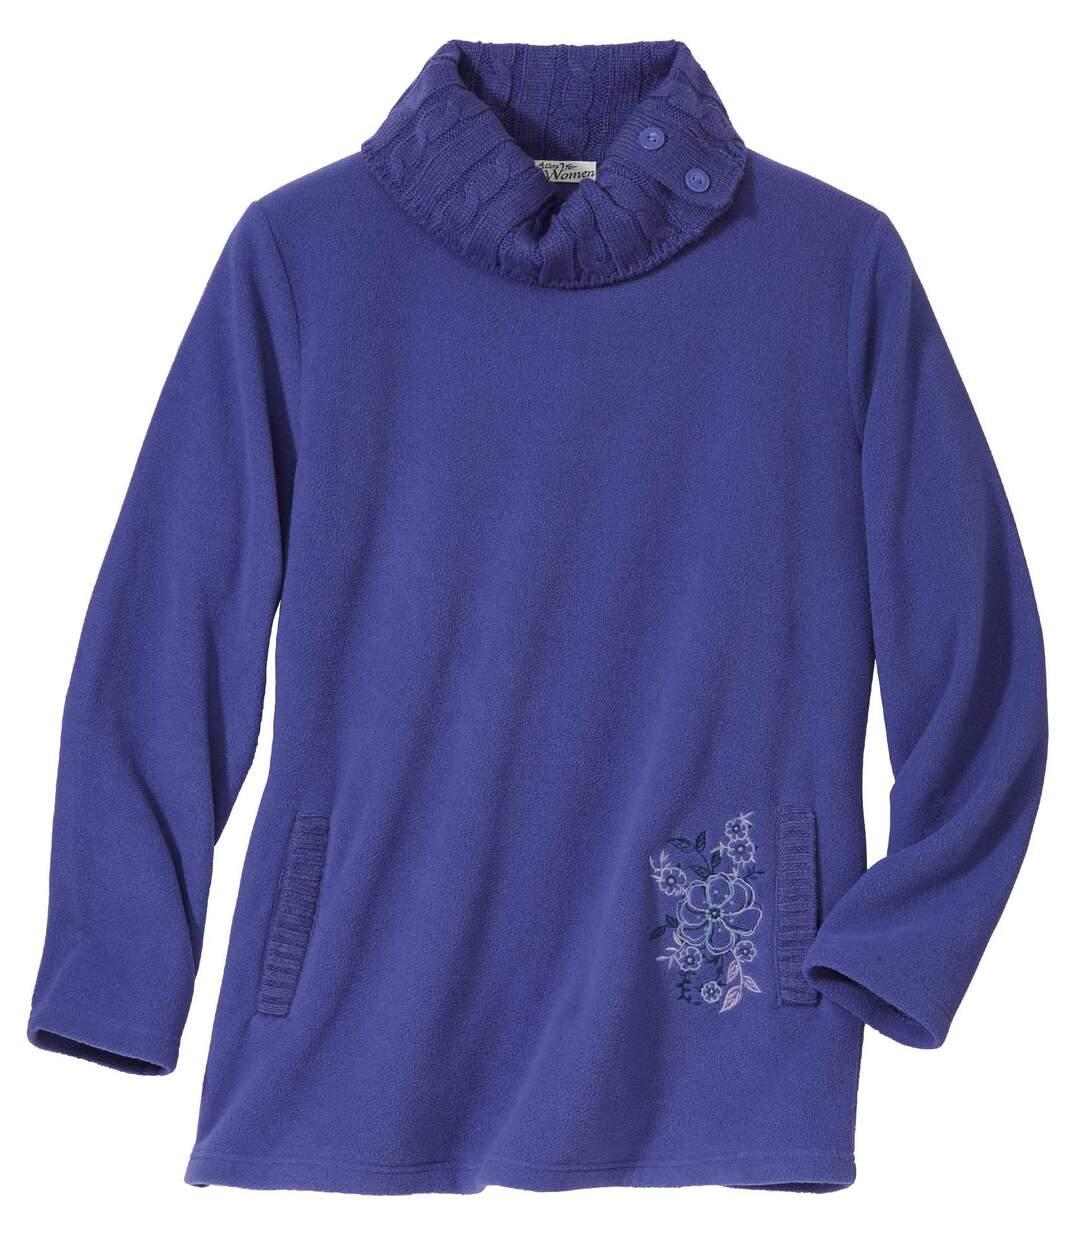 Pullover aus Microfleece im Tunika-Stil